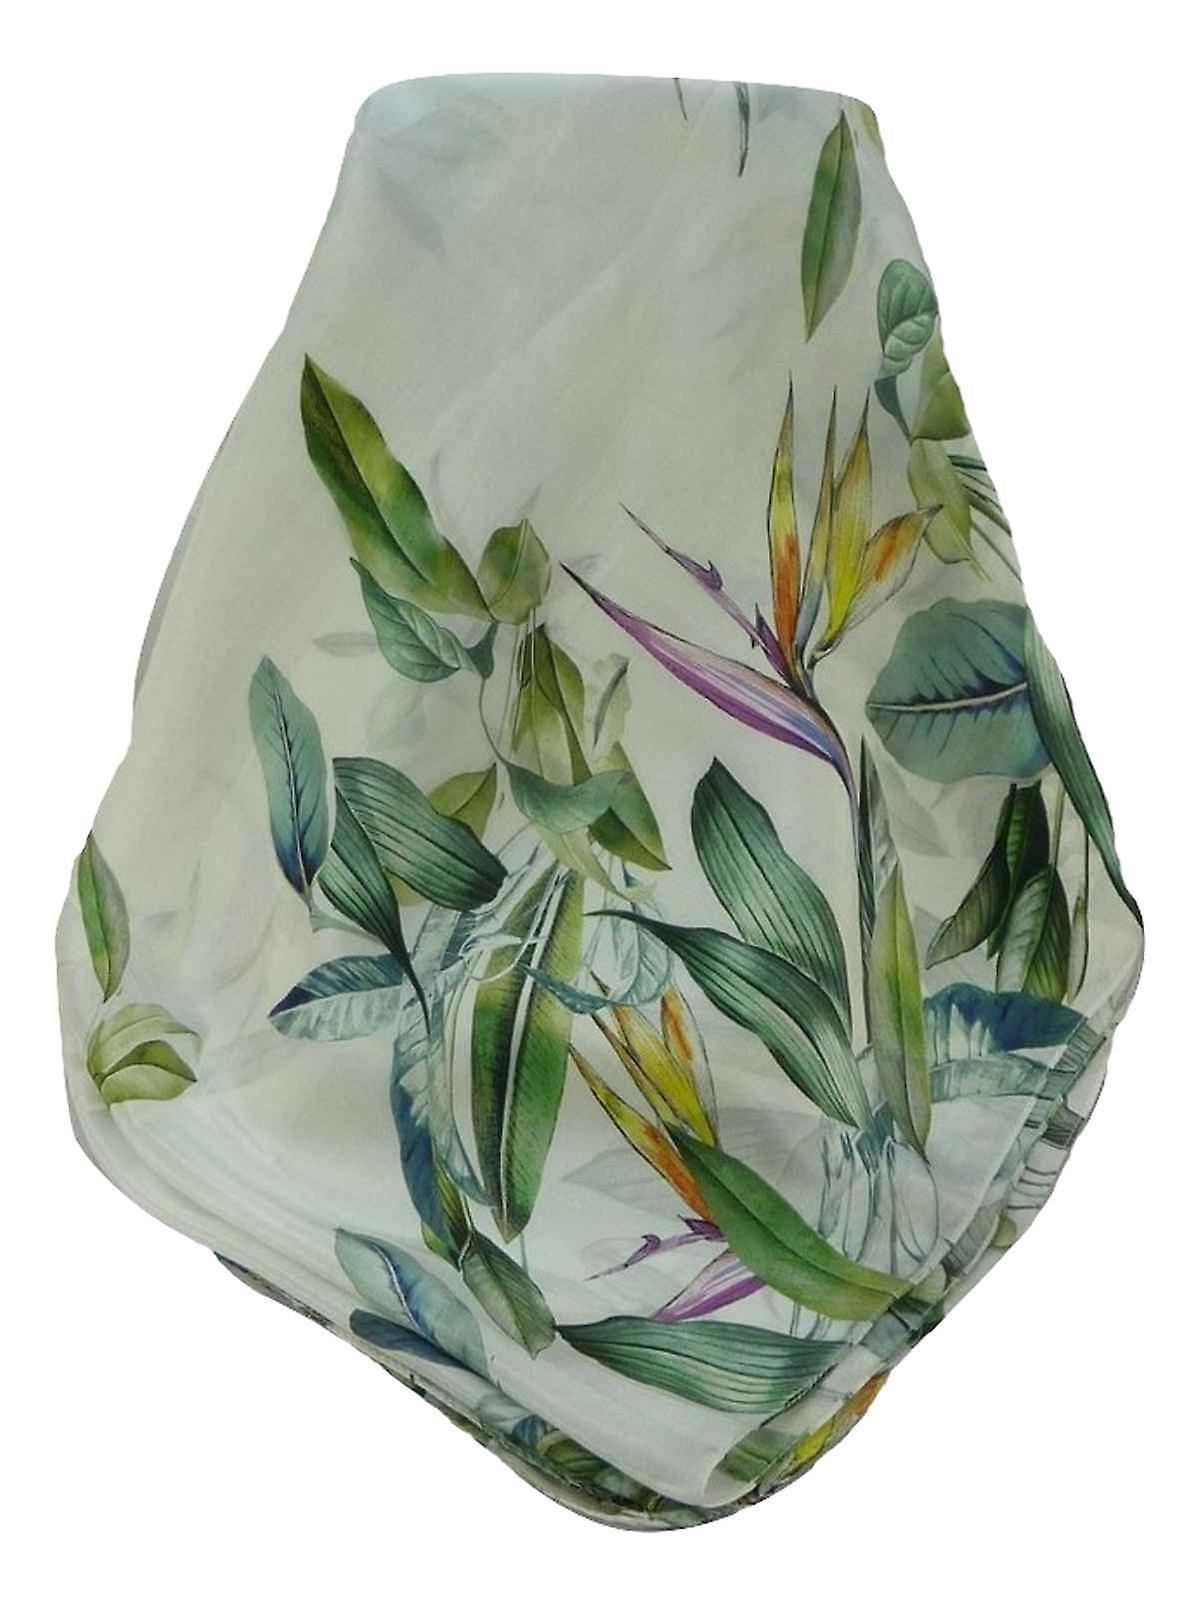 Supersized Handloom Saurshatra Silk Scarf or Stole Bird of Paradise Pattern by Pashmina & Silk